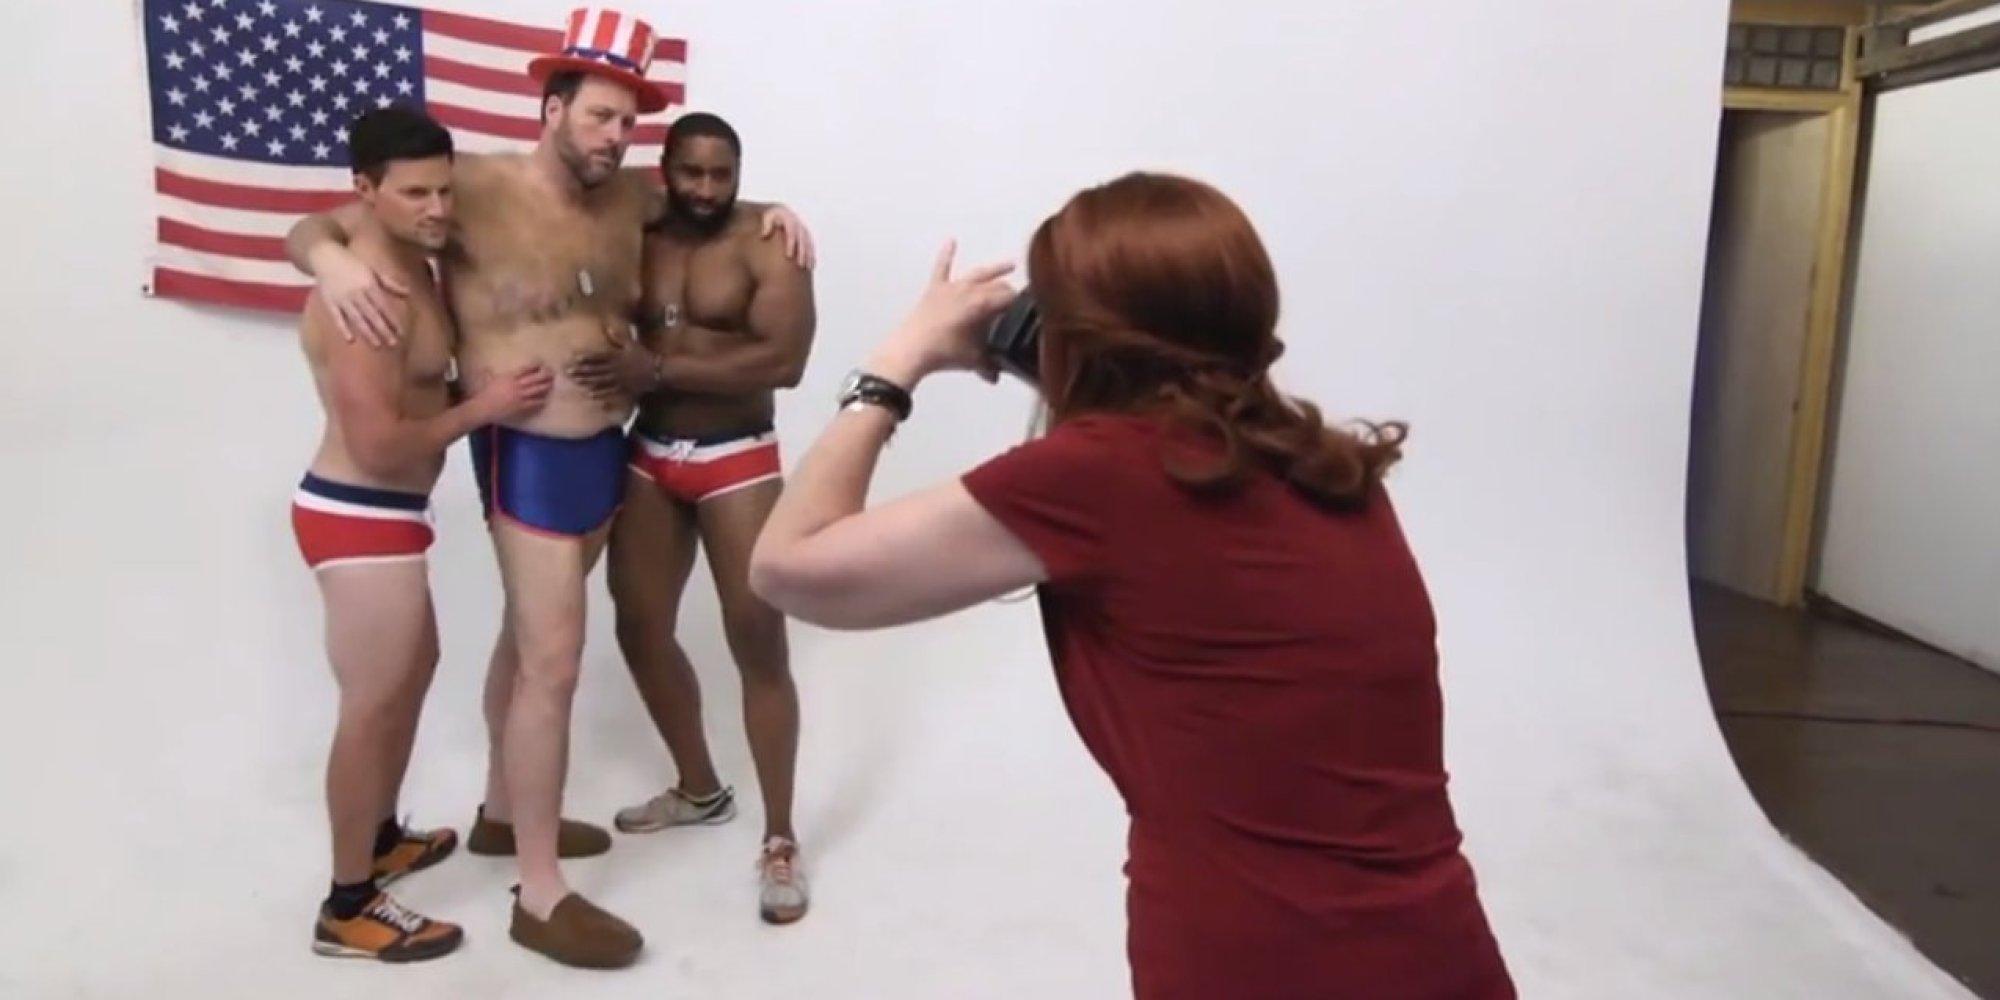 Gay sex videos